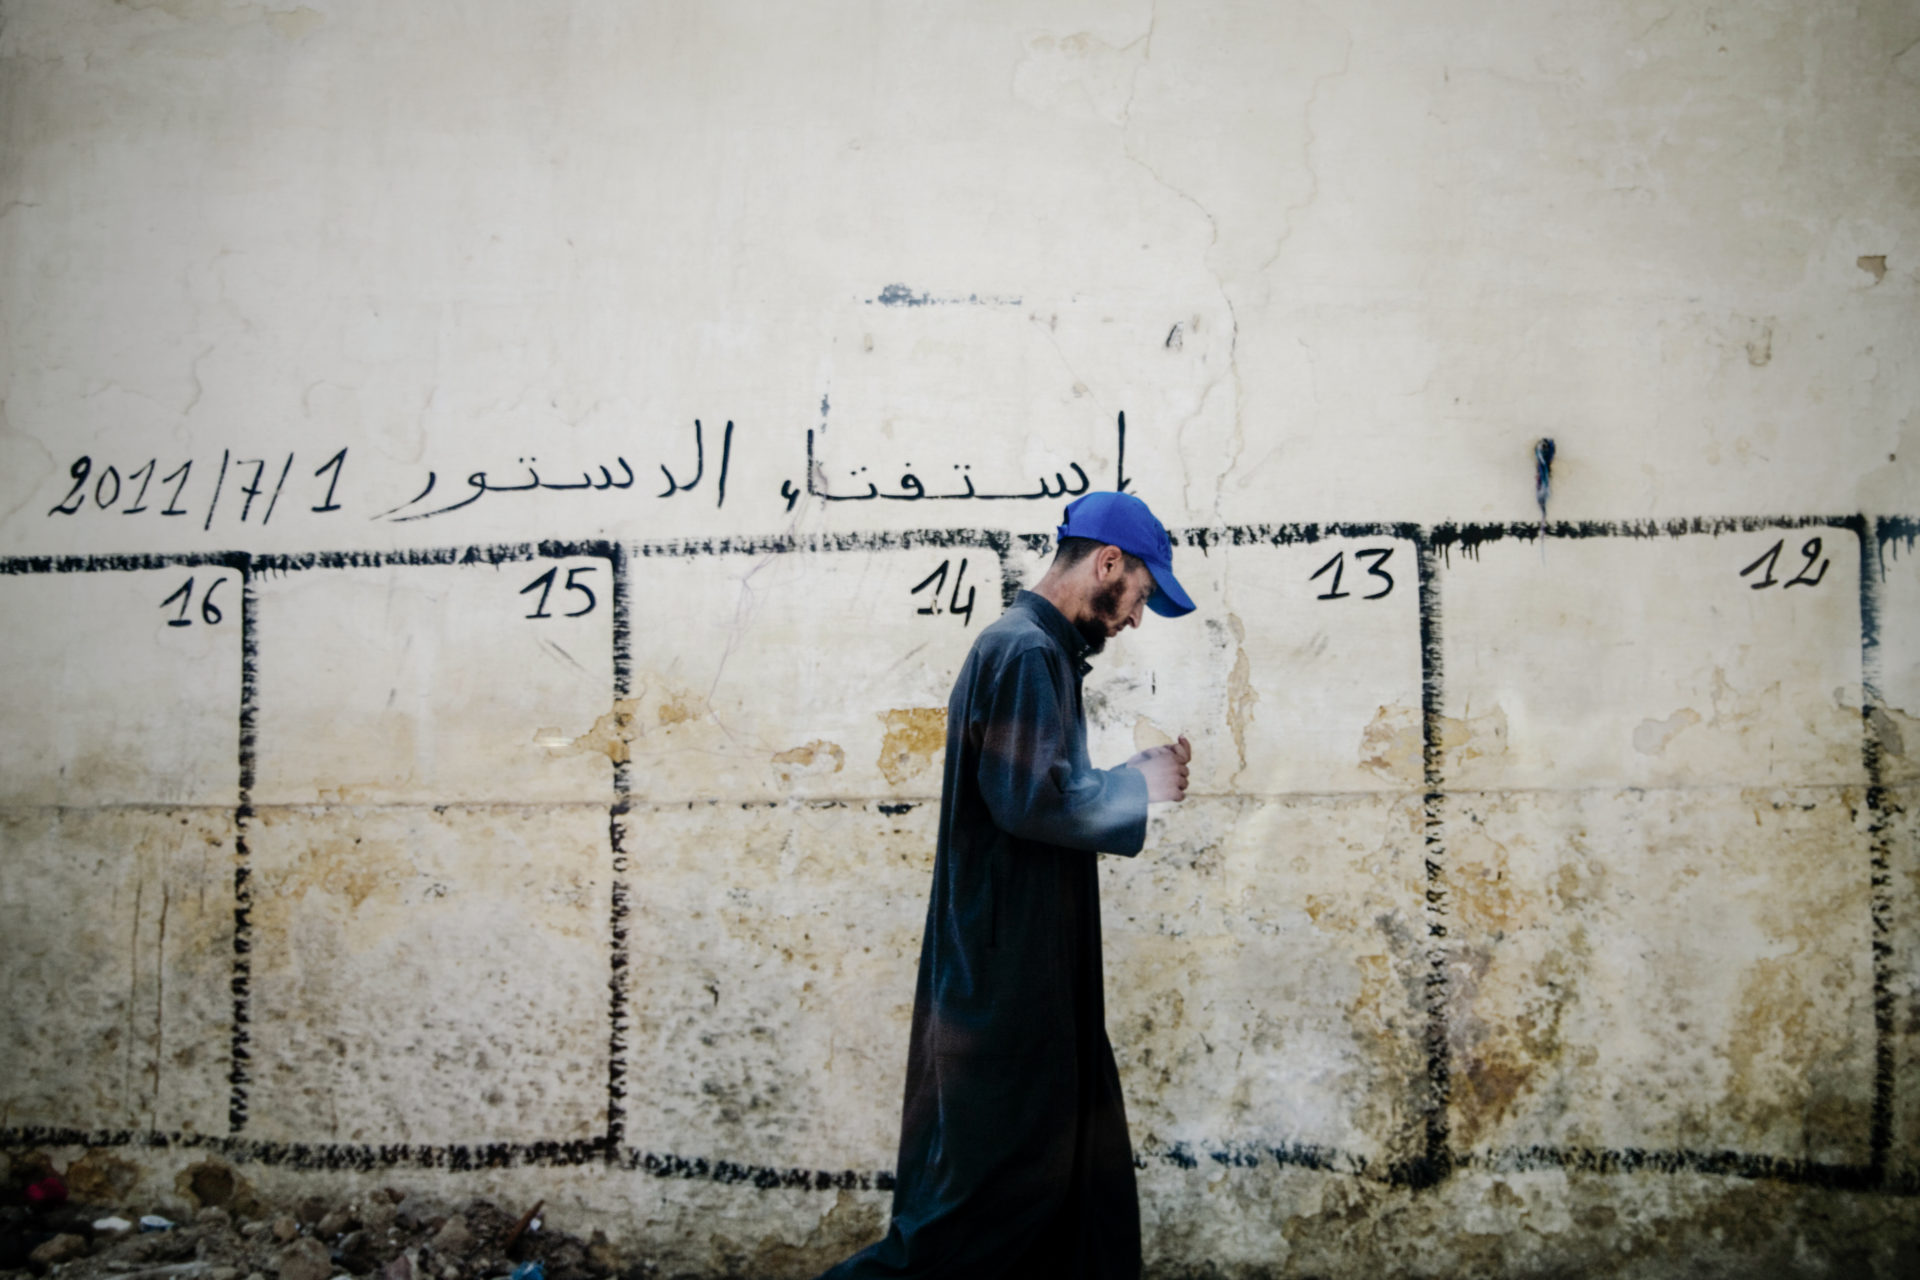 GIZ_Morocco_Culture_Election_IGP0649_Carolin-Weinkopf